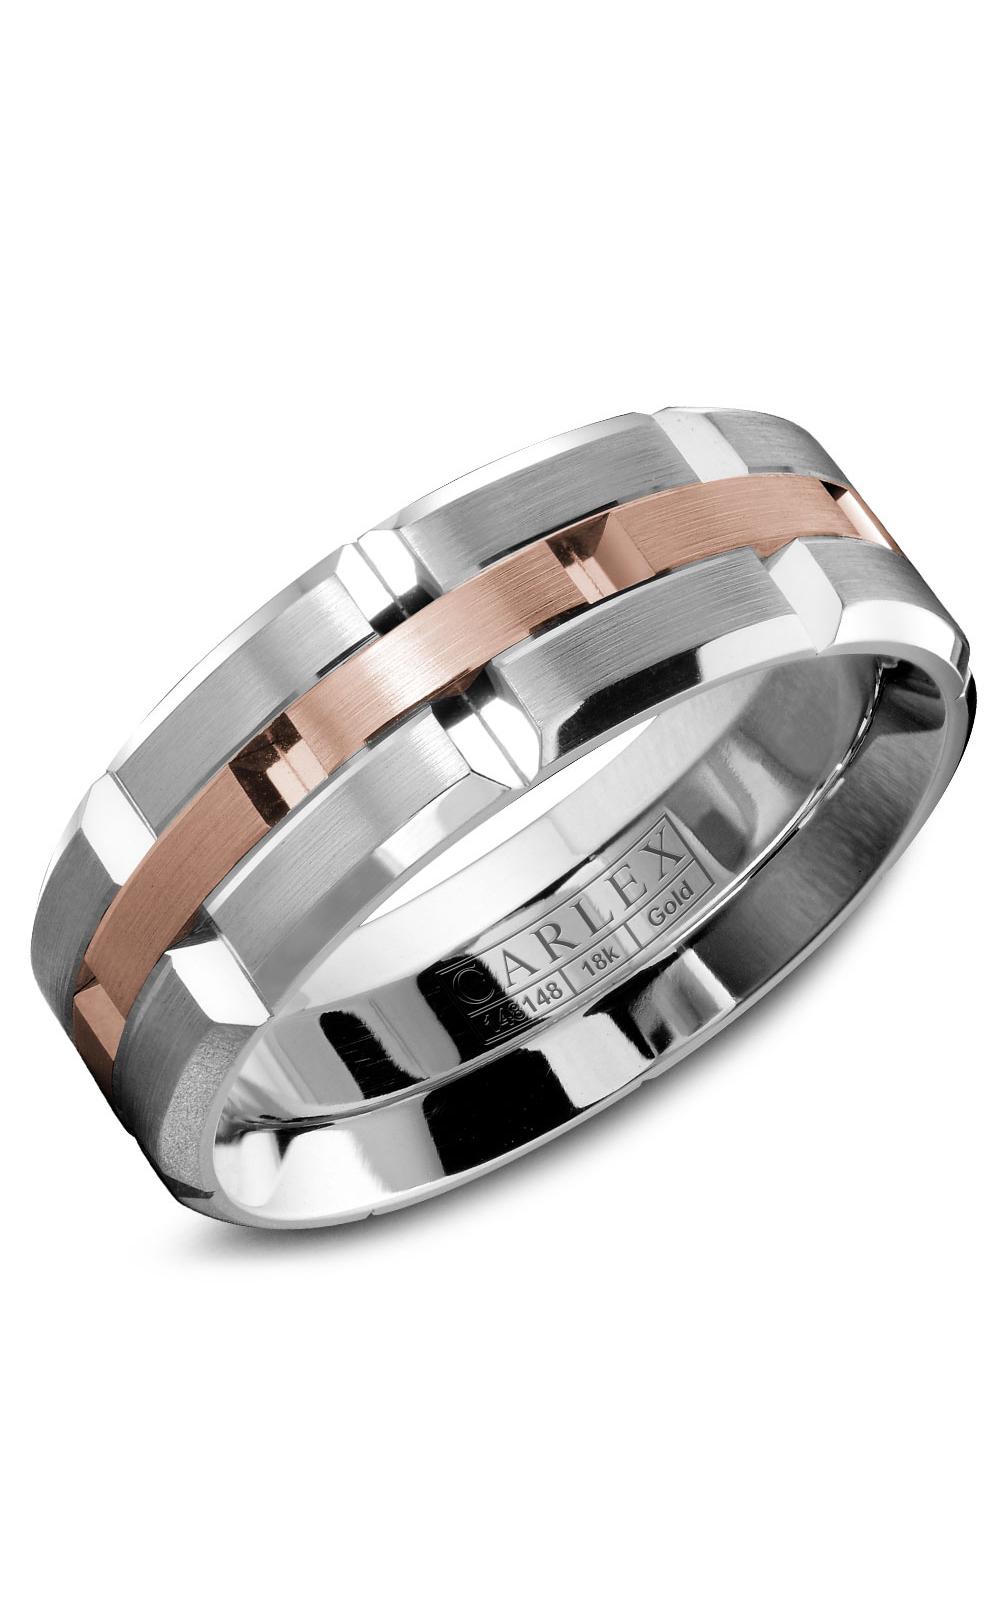 Carlex G1 Men's Wedding Band WB-9146RW product image